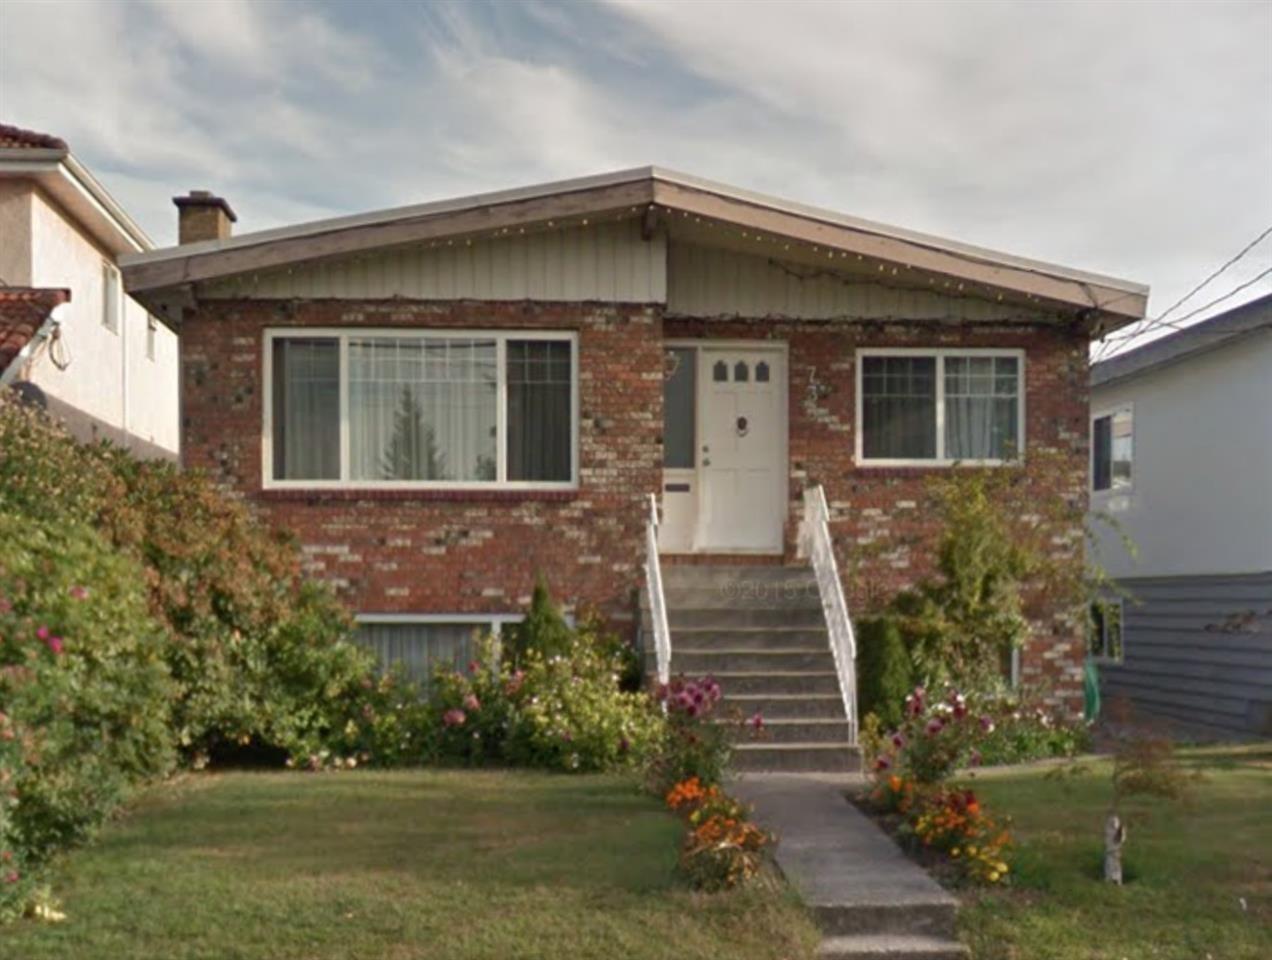 R2156890 - 733 E 54TH AVENUE, South Vancouver, Vancouver, BC - House/Single Family